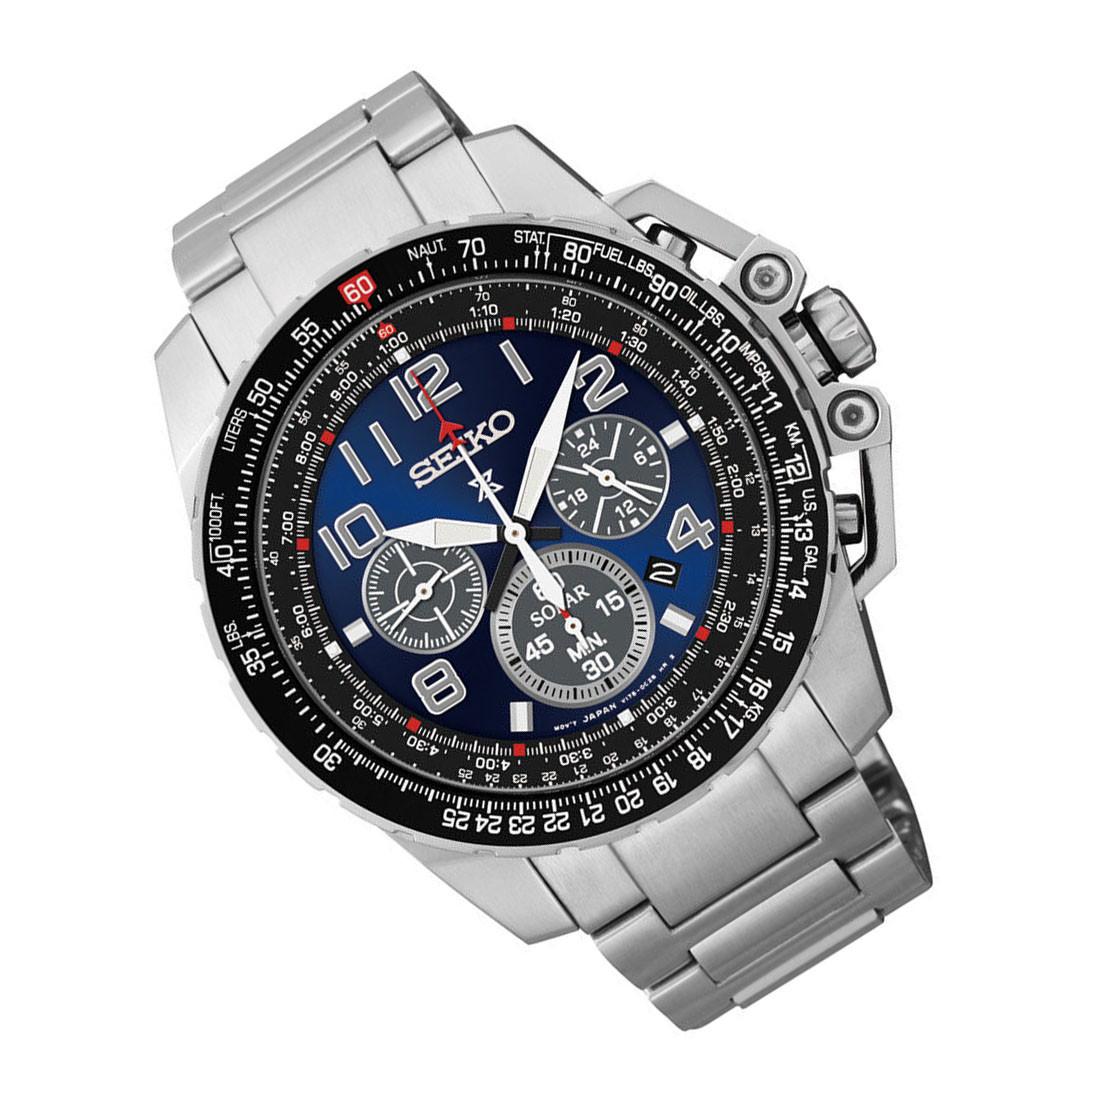 Часы Seiko Prospex SSC275P1 SOLAR V175 (уценка)